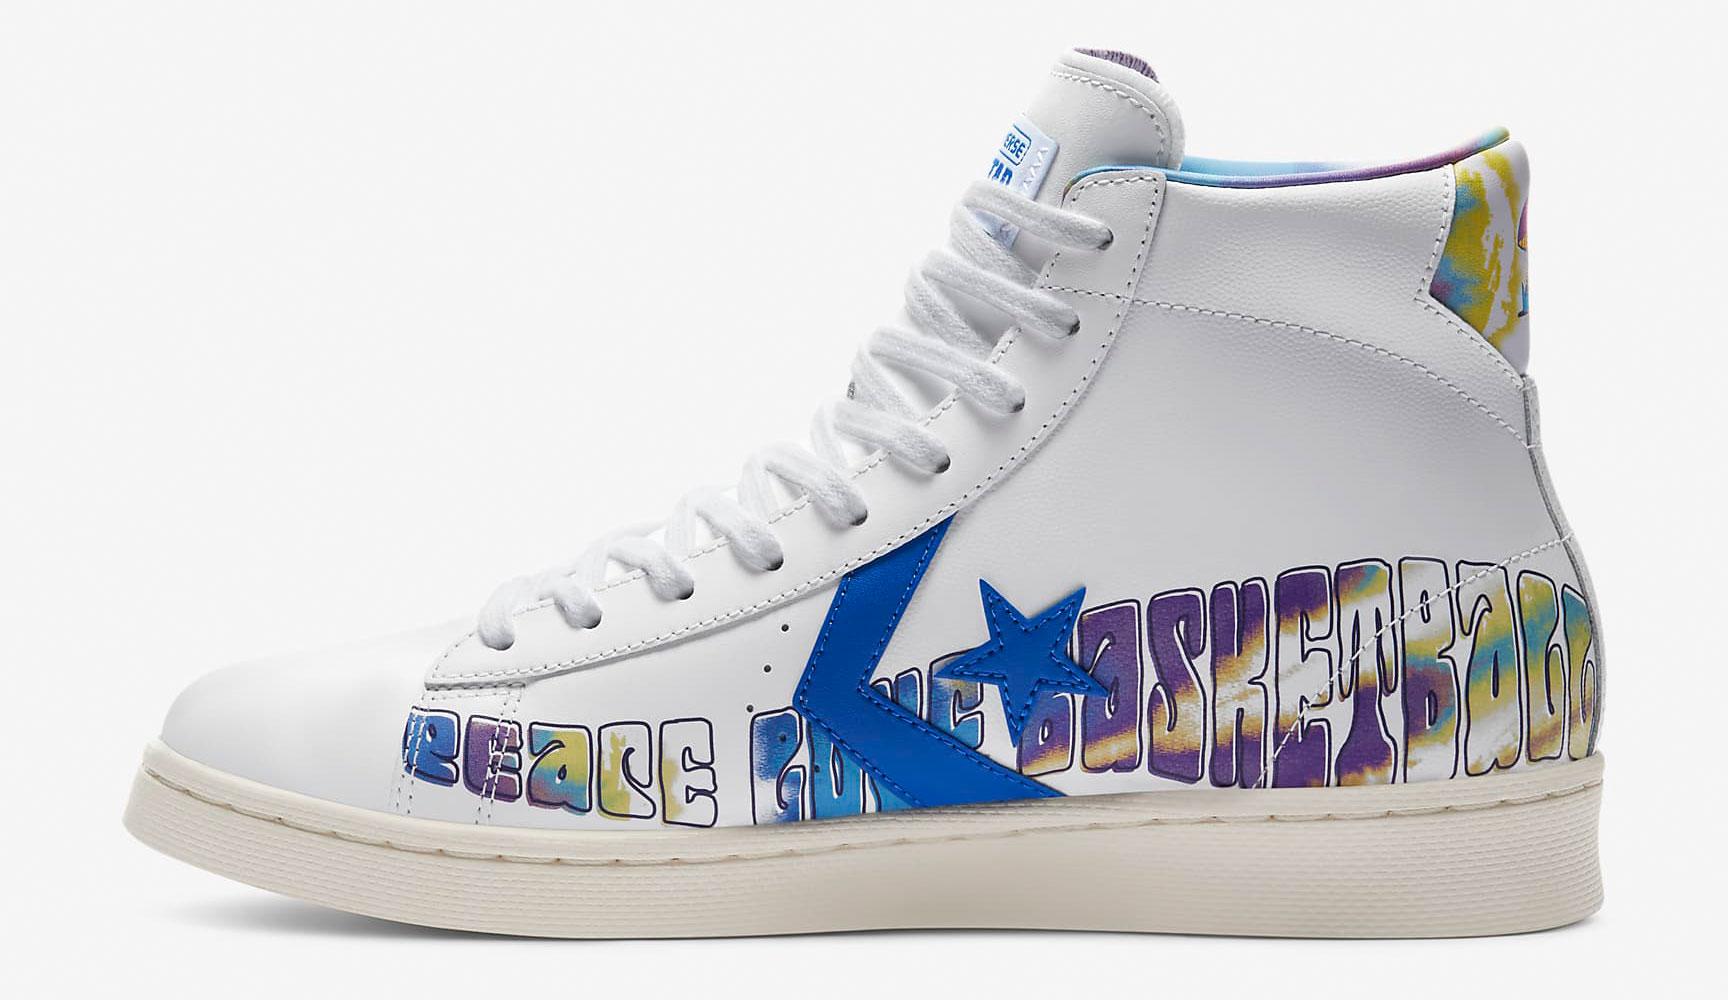 nike-converse-pro-leather-peace-love-basketball-release-date